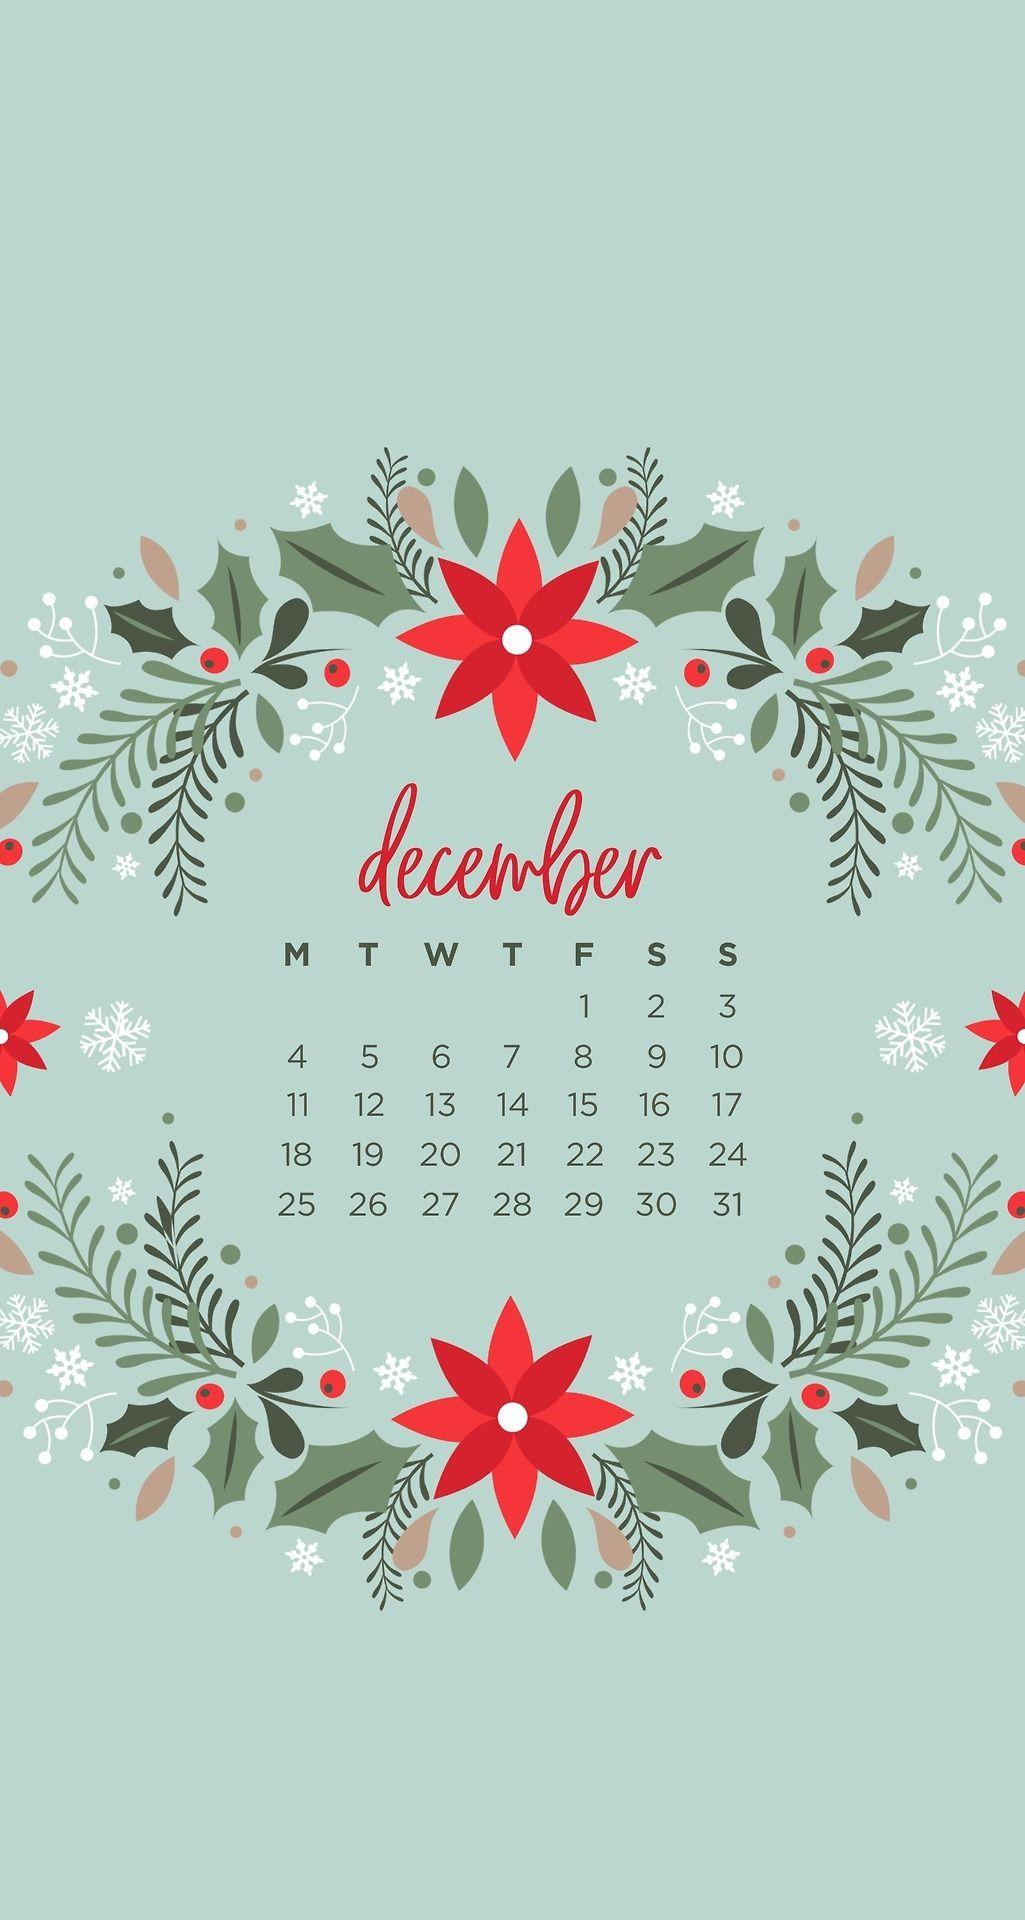 December calendar Christmas Patterned Phone iPhone